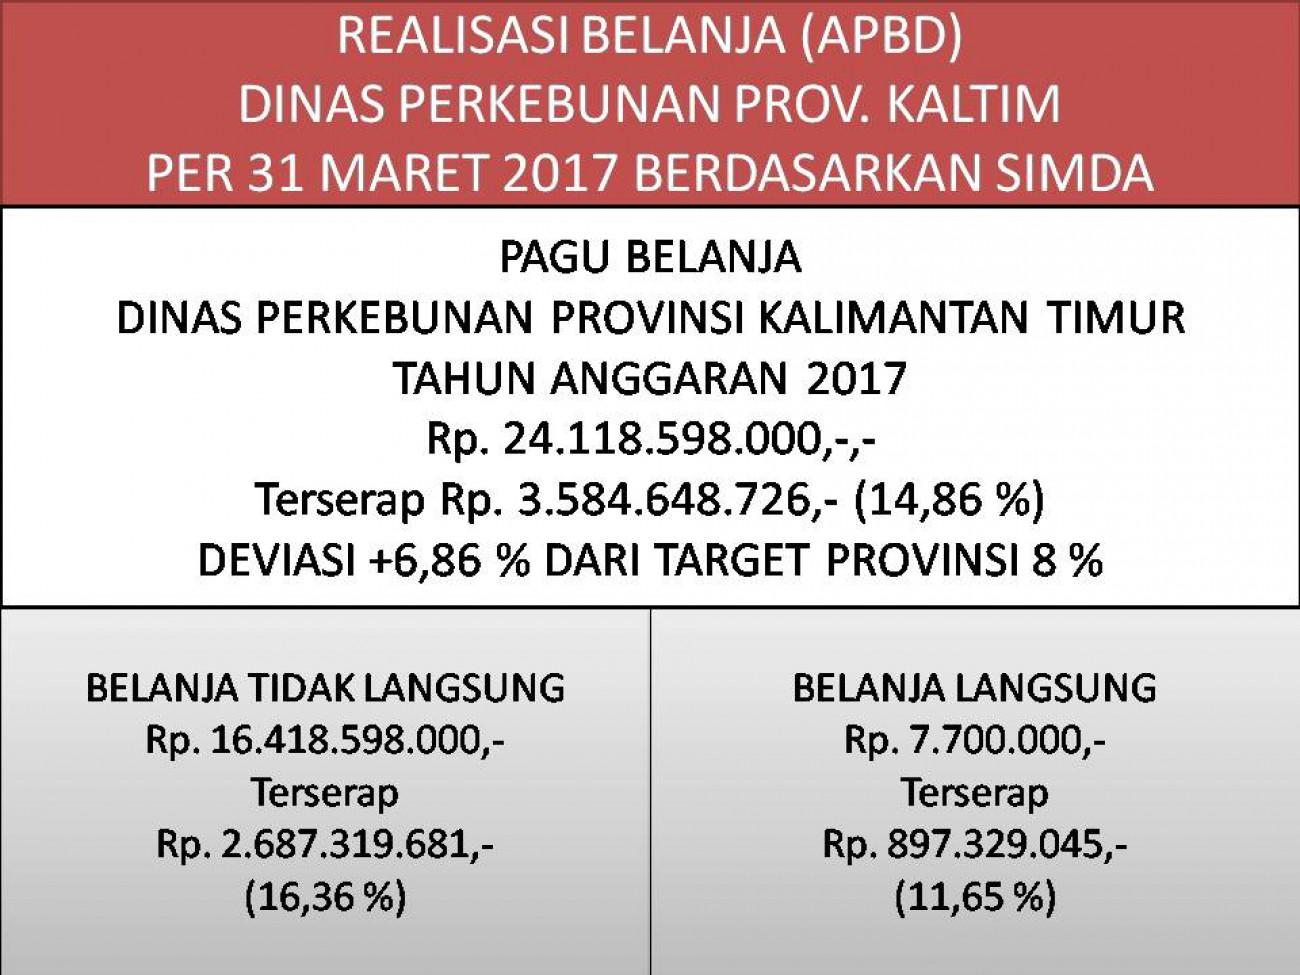 Laporan Realisasi APBD Dinas Perkebunan Prov. Kaltim Bulan Maret 2017